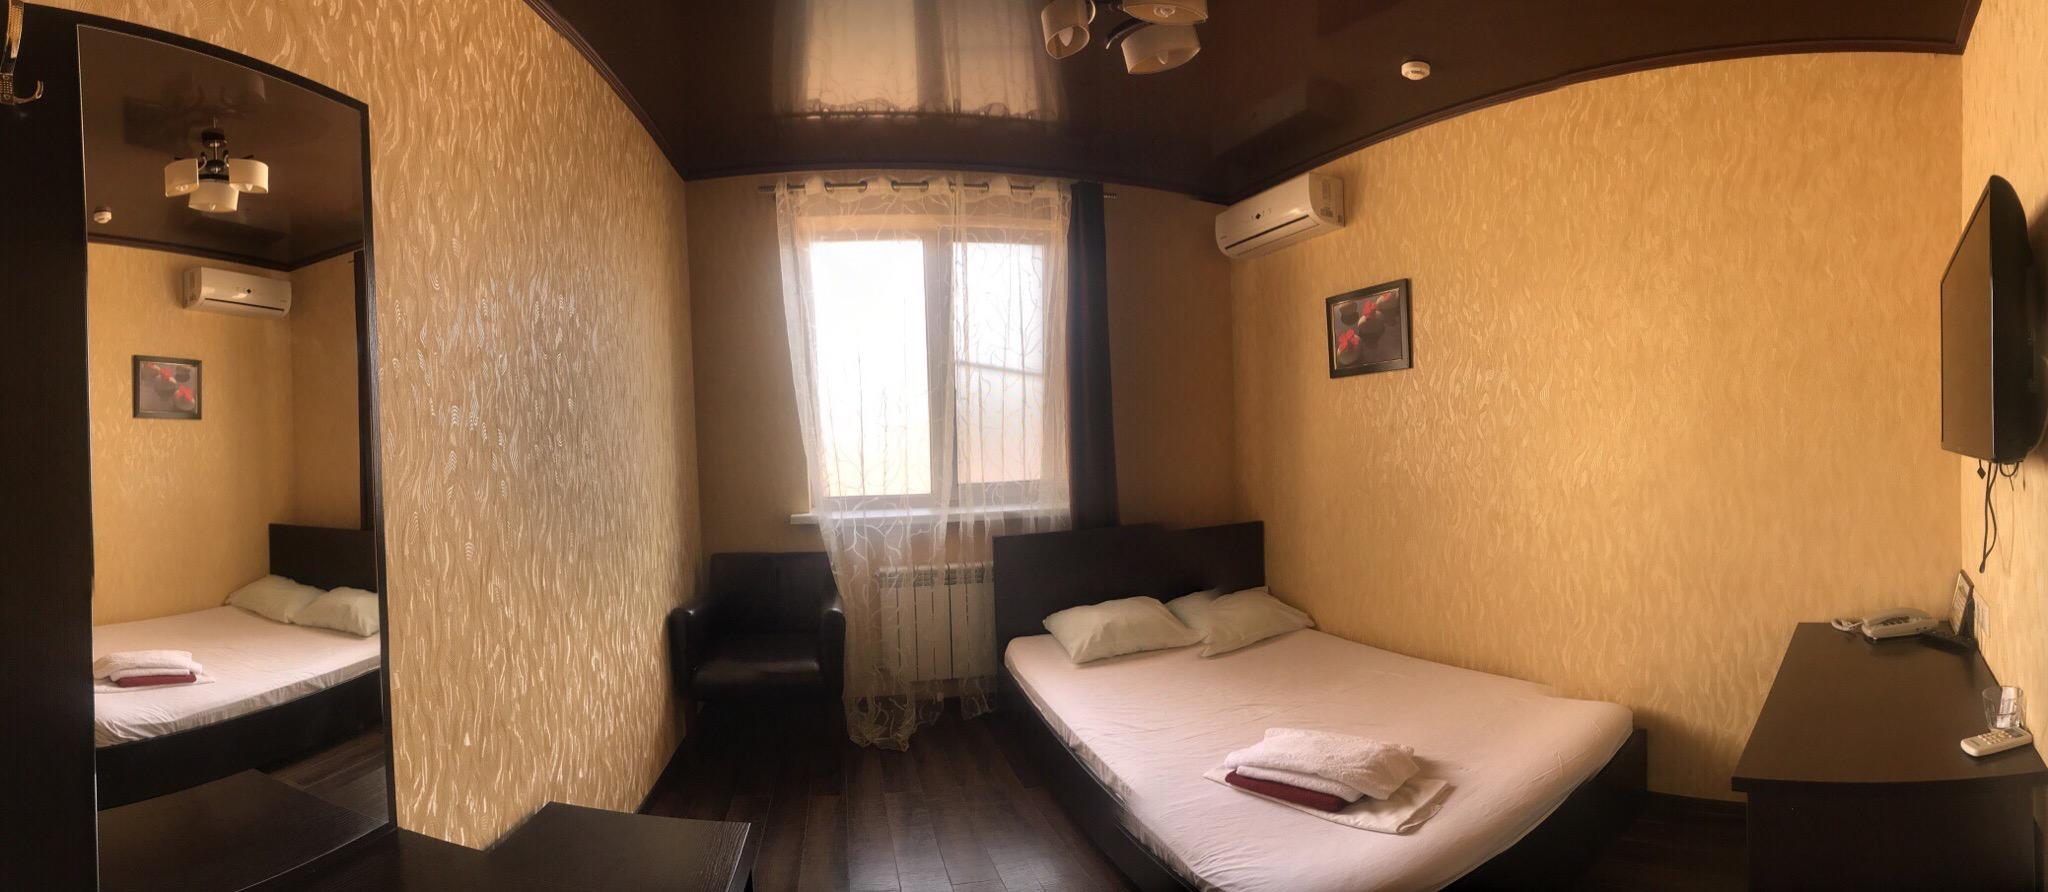 Номер стандарт в отеле Визит